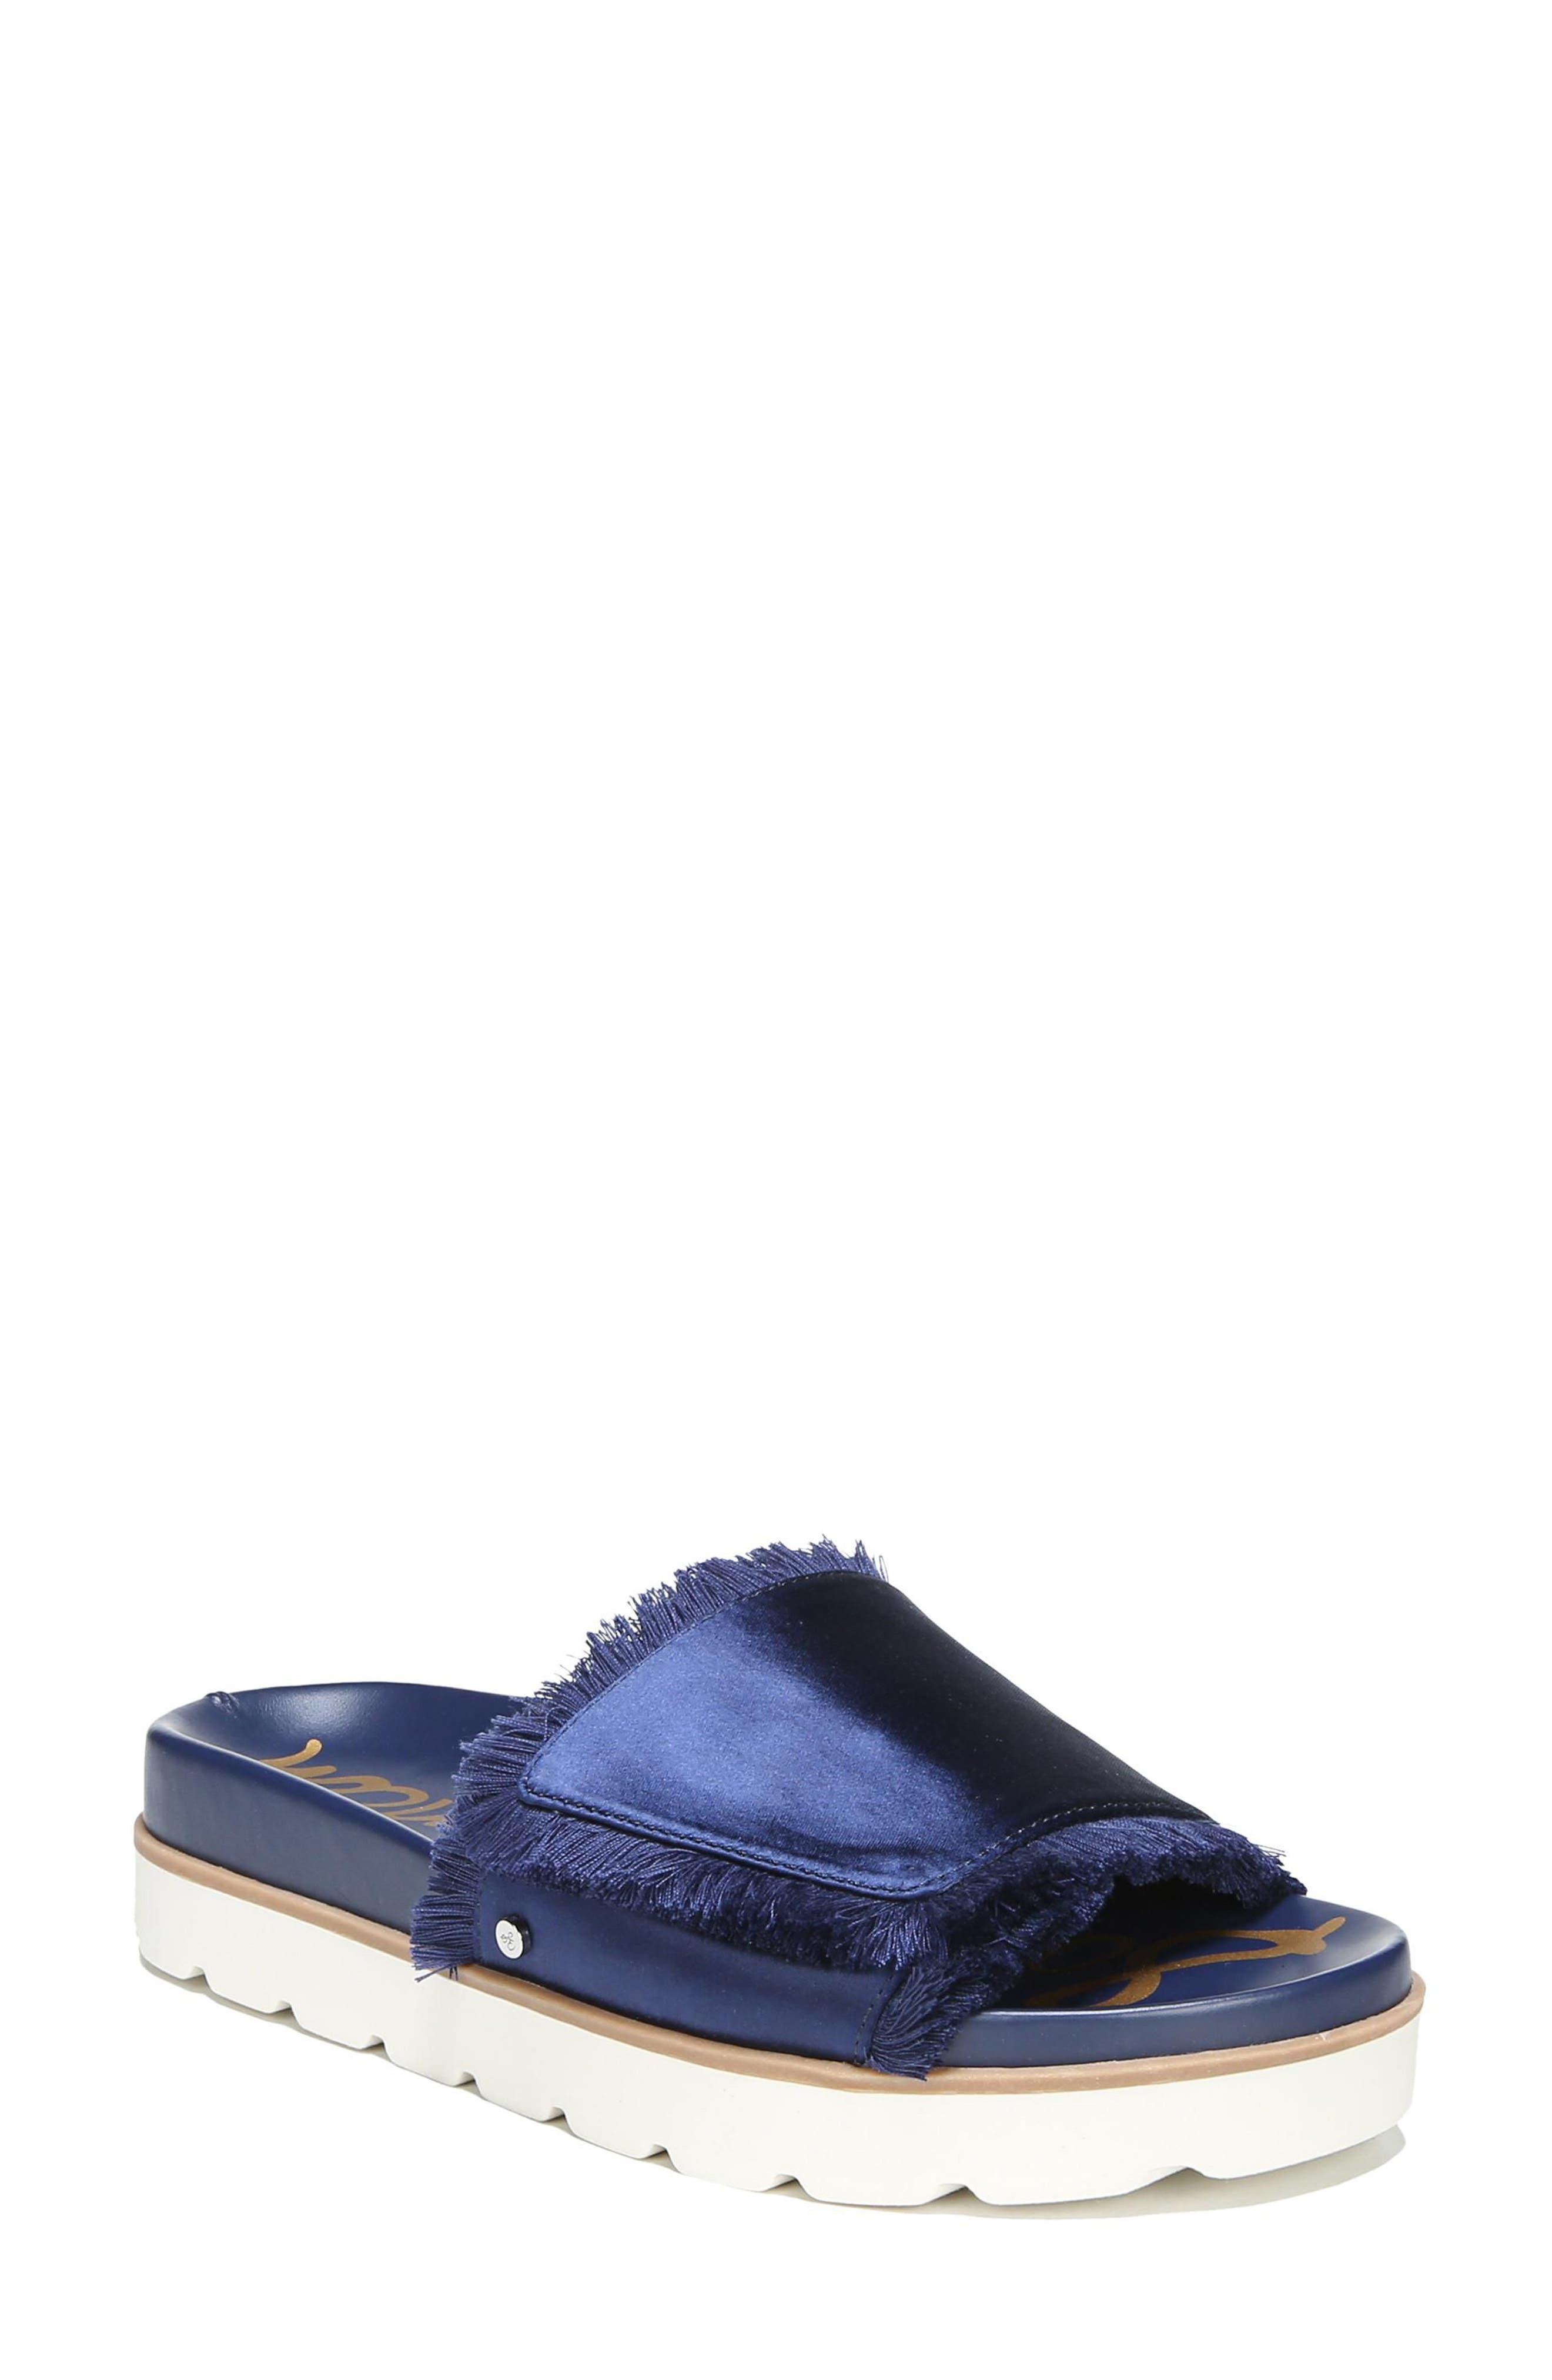 Mares Slide Sandal,                             Main thumbnail 1, color,                             Poseidon Blue Satin